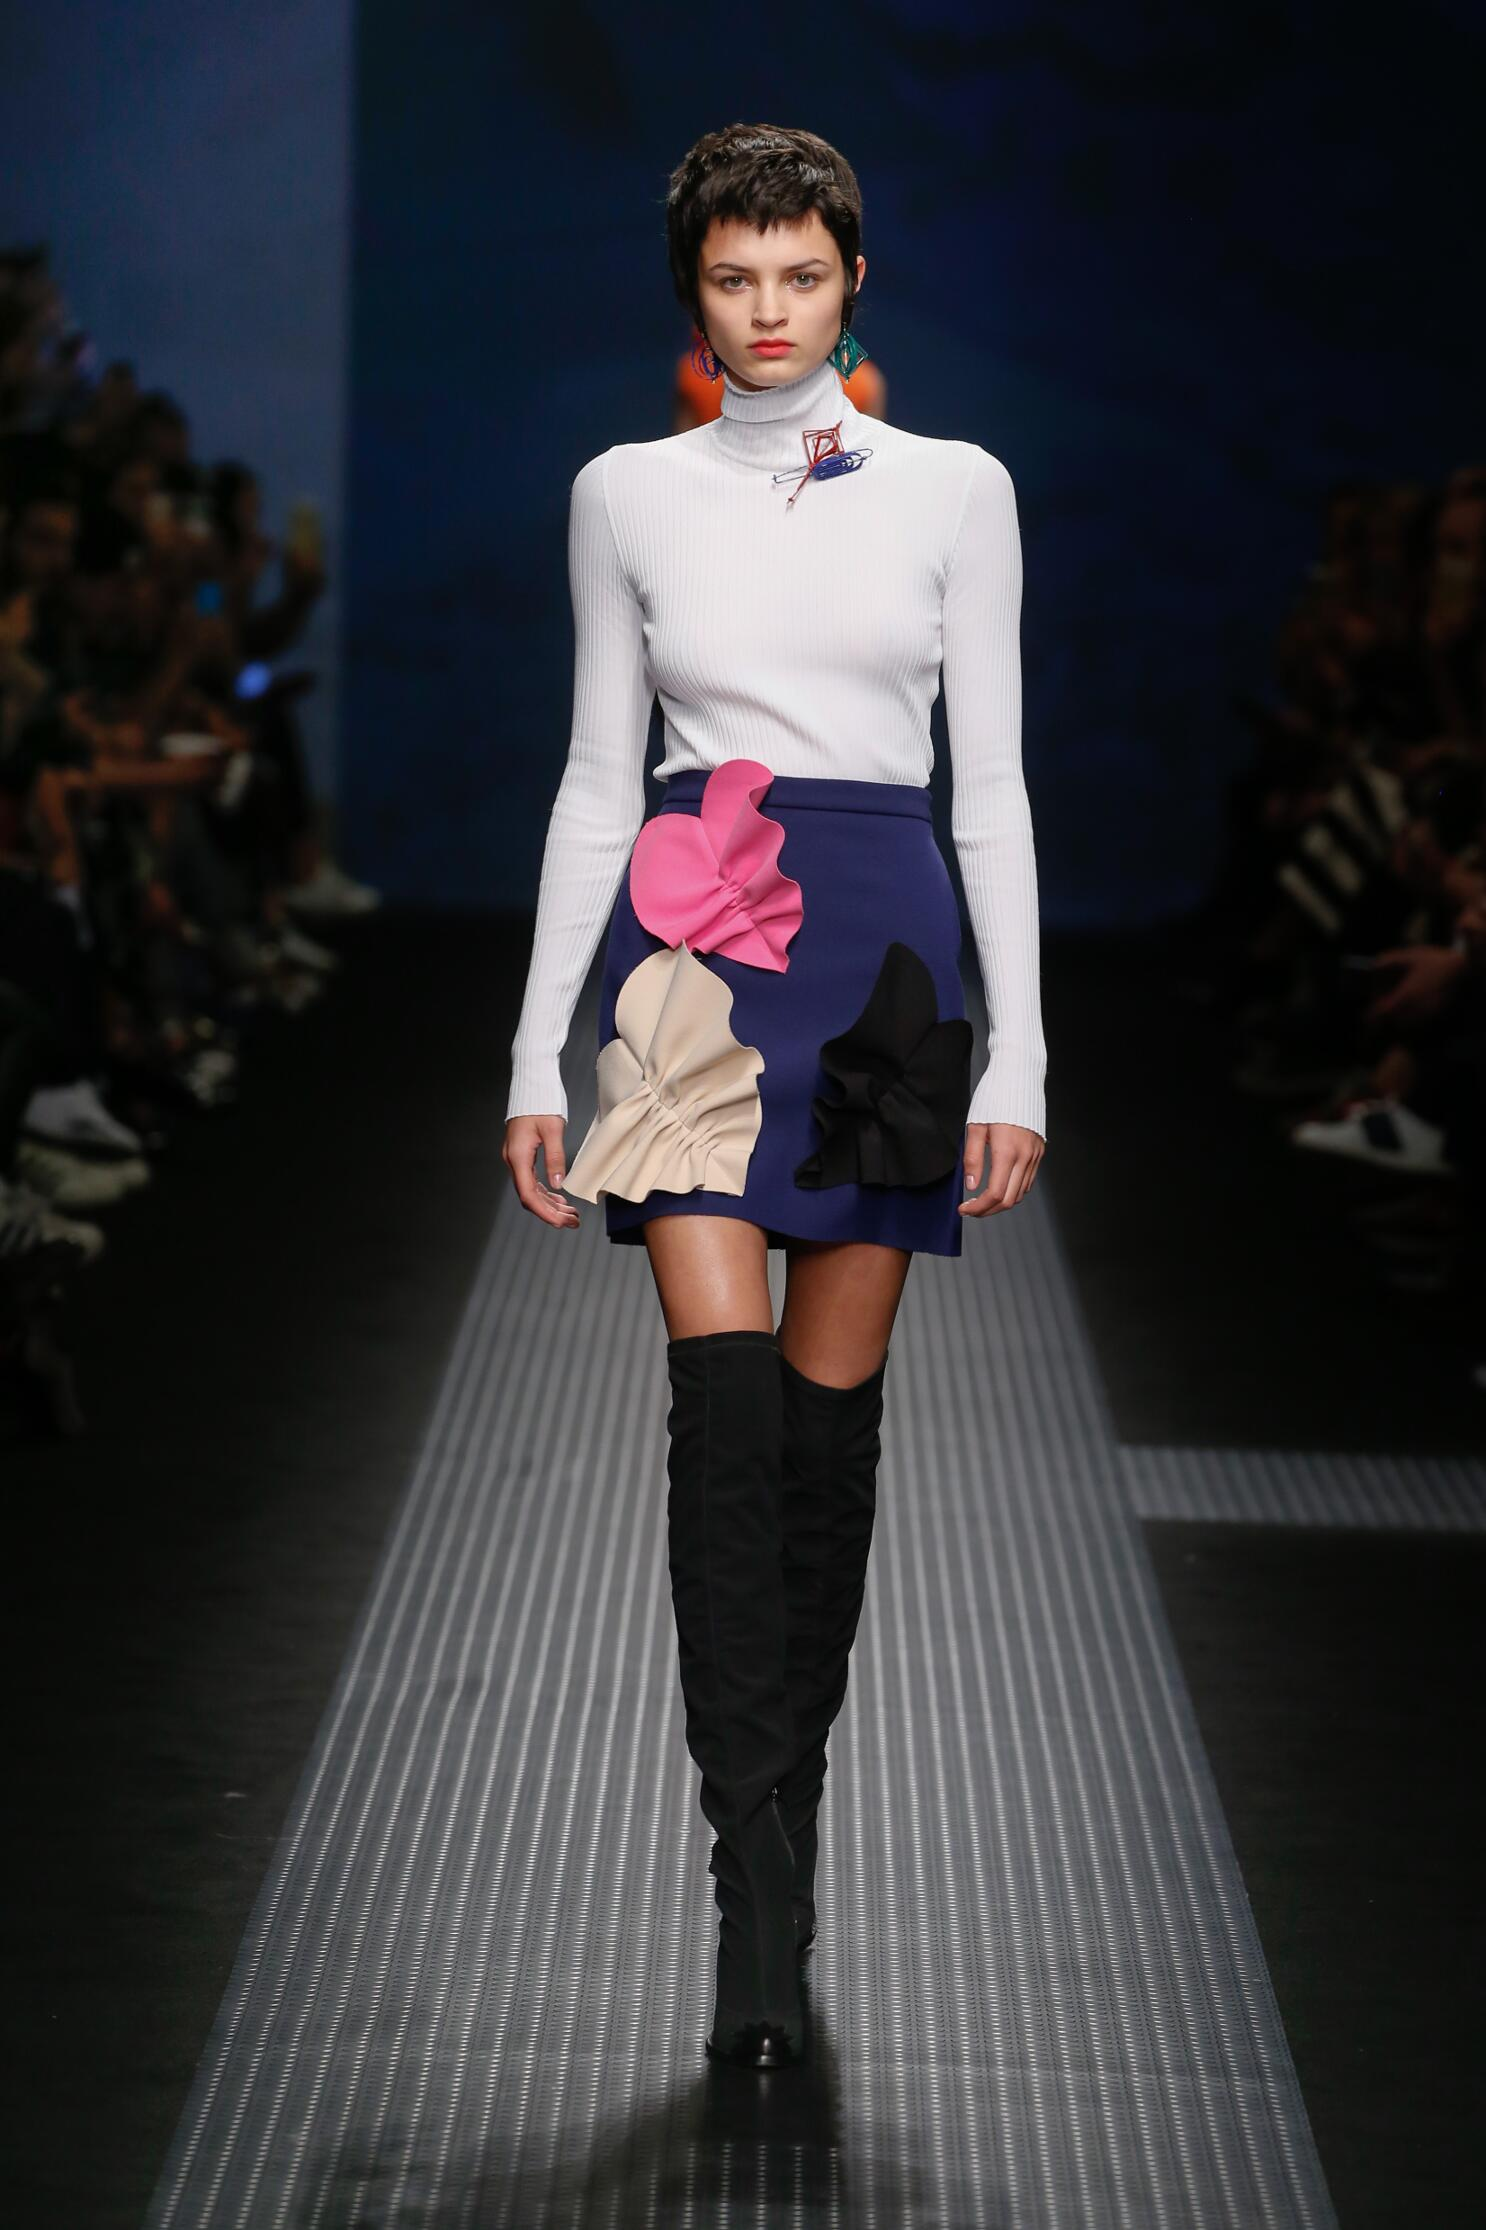 2016 Fall Fashion Woman Msgm Collection